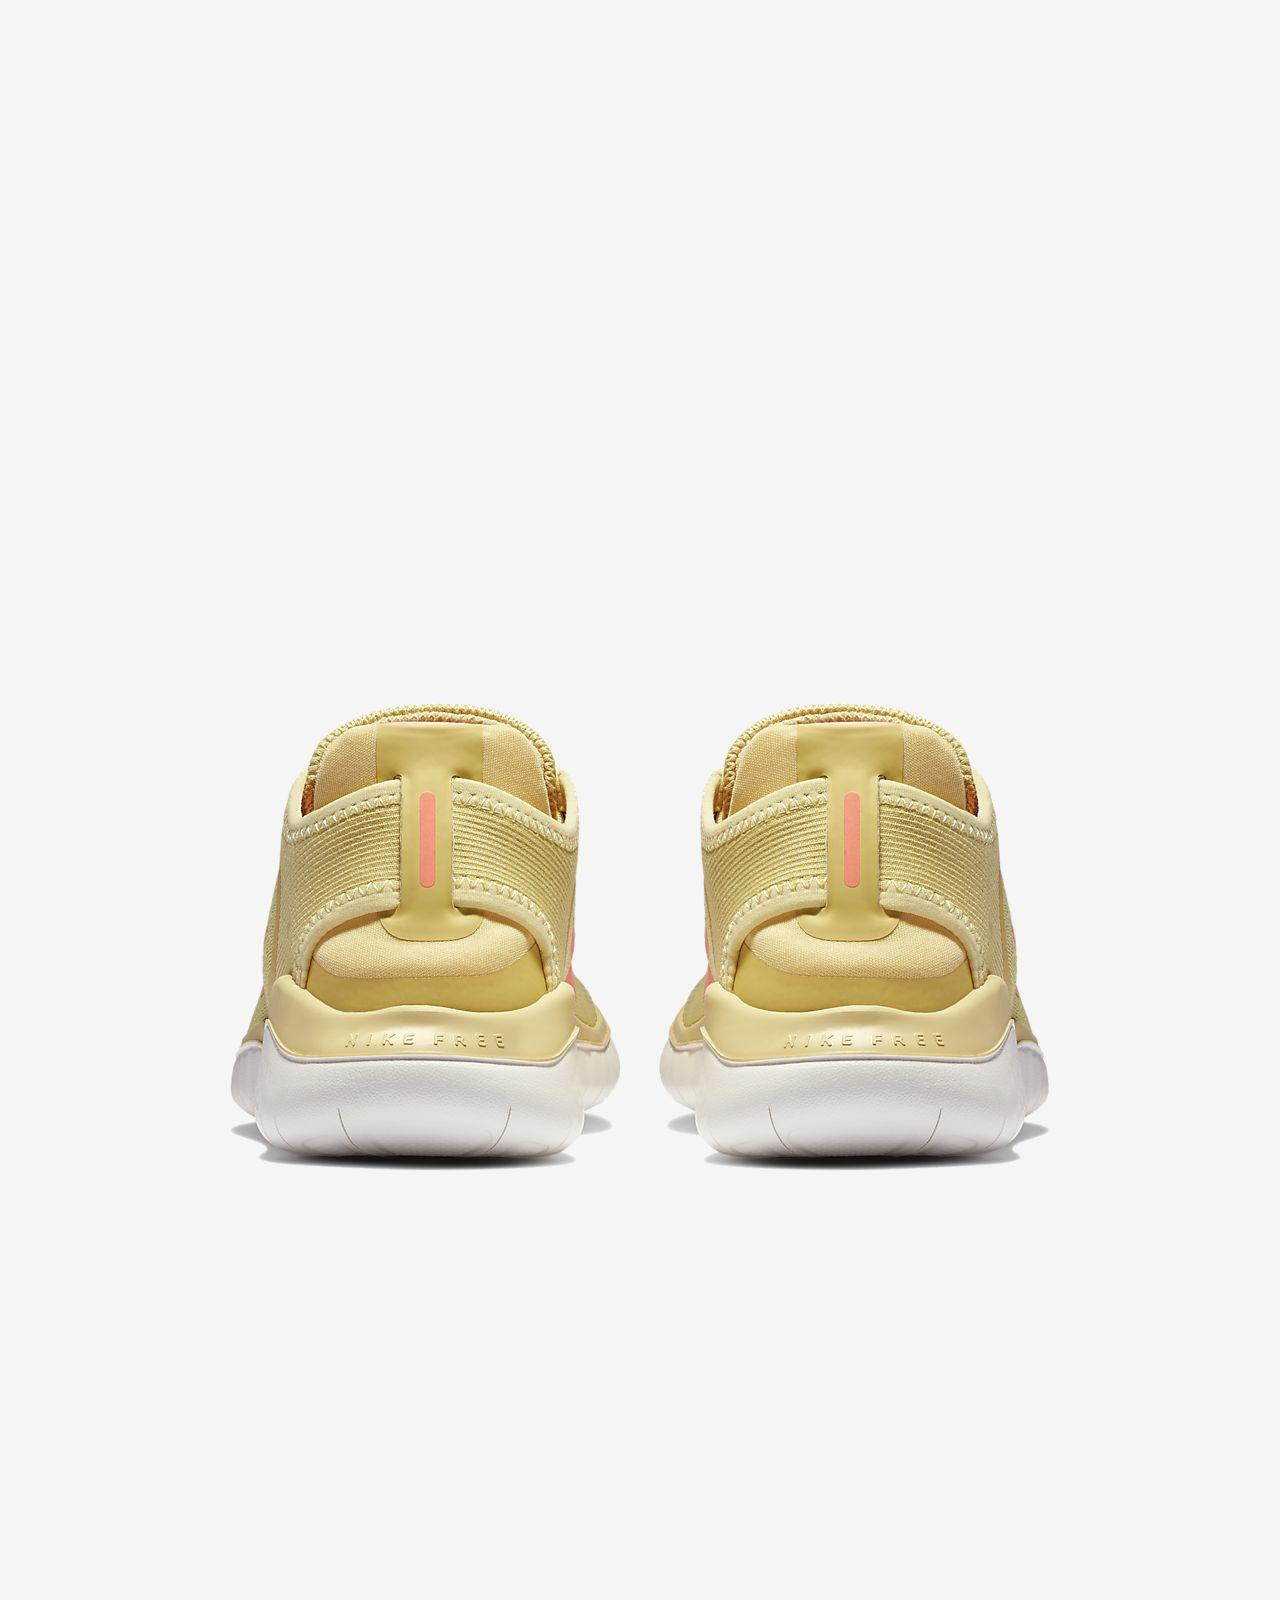 online store ecf88 745b6 ... Nike Free RN 2018 Summer Womens Running Shoe